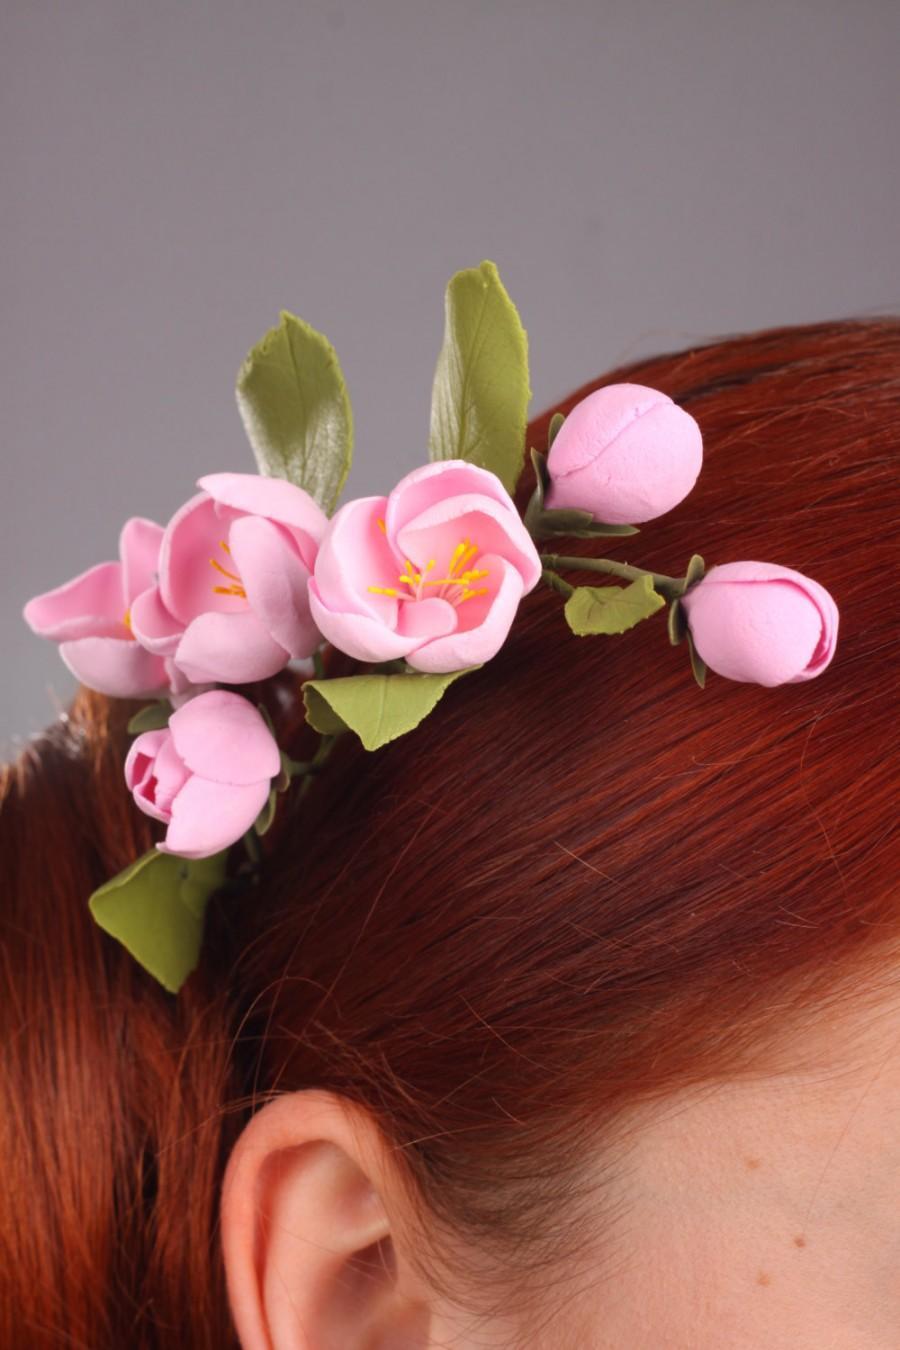 Hochzeit - Hair clay flowers, hair decoration, hair accessories, pink apple flowers